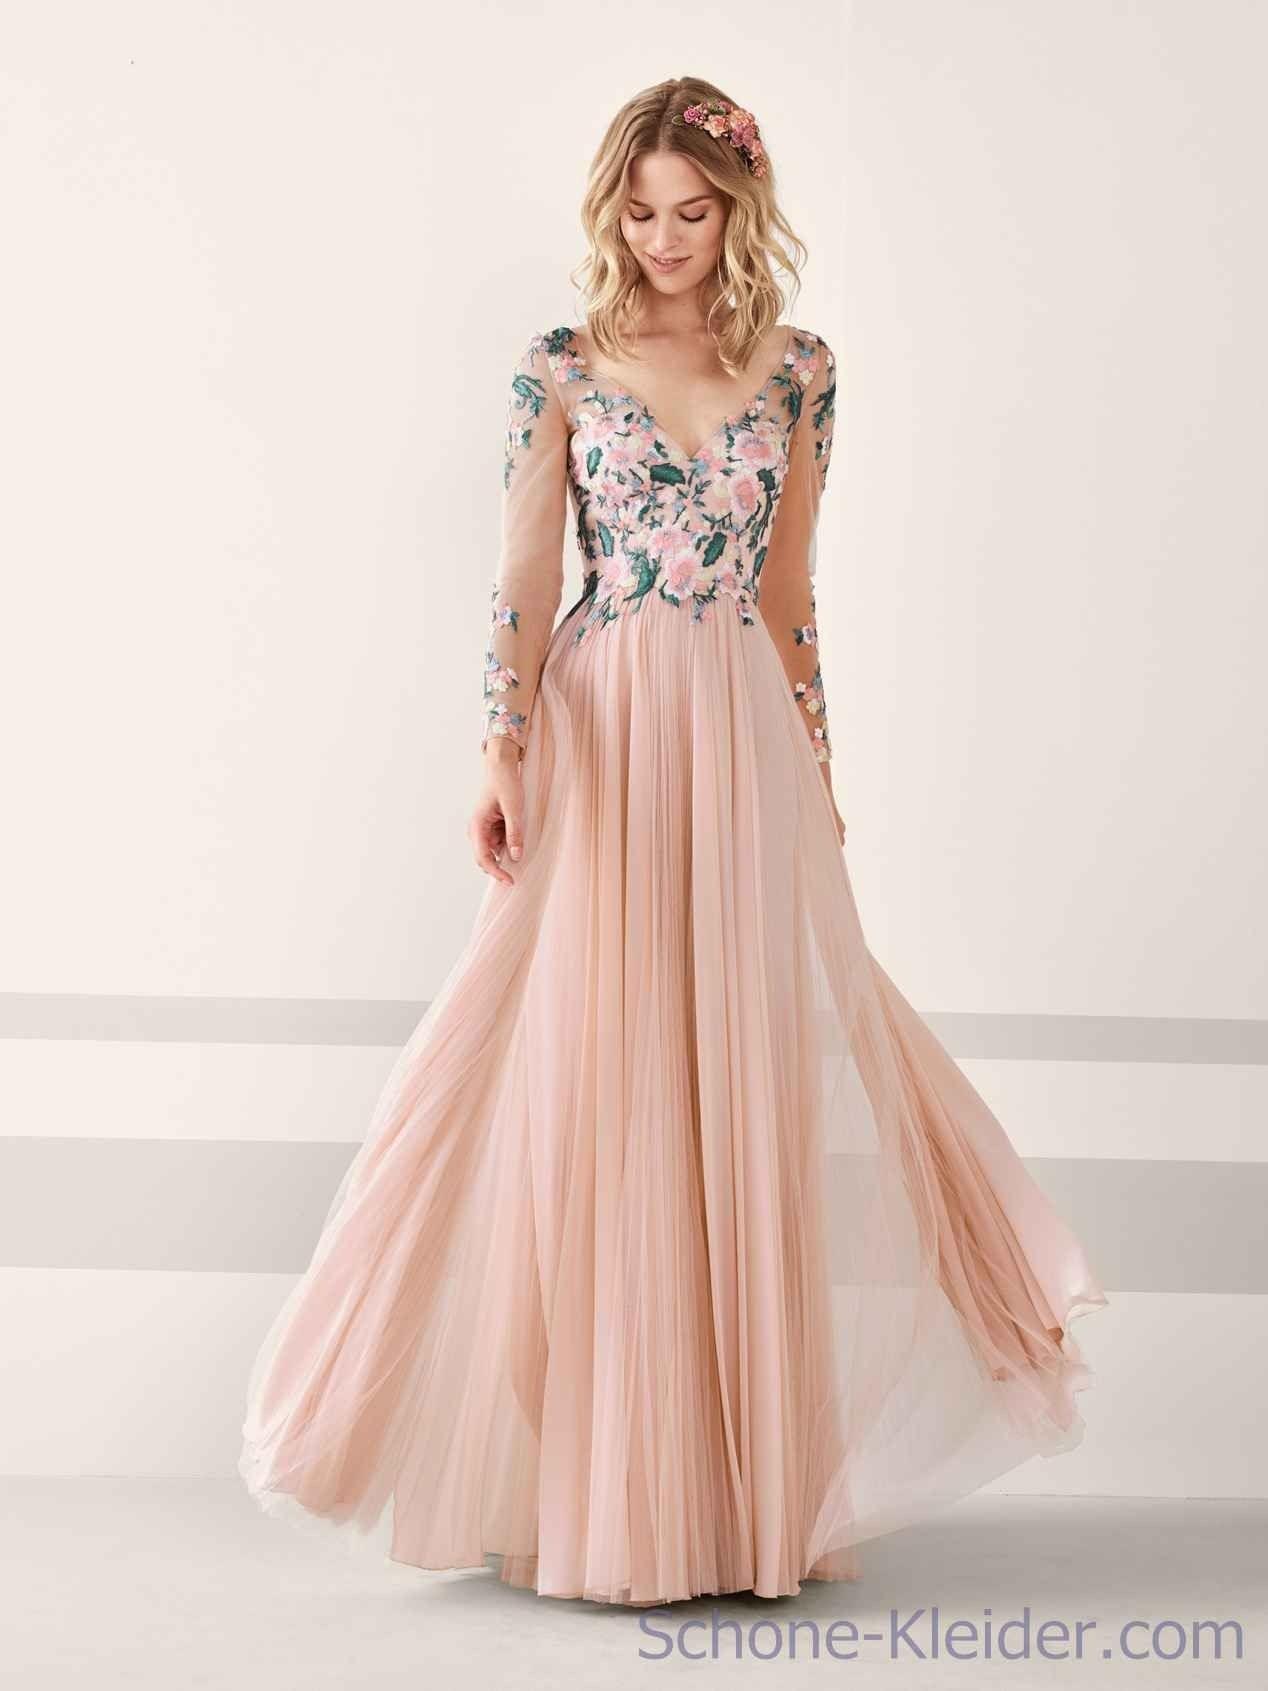 11 Einzigartig Abendkleider Lang Junge Mode Stylish - Abendkleid